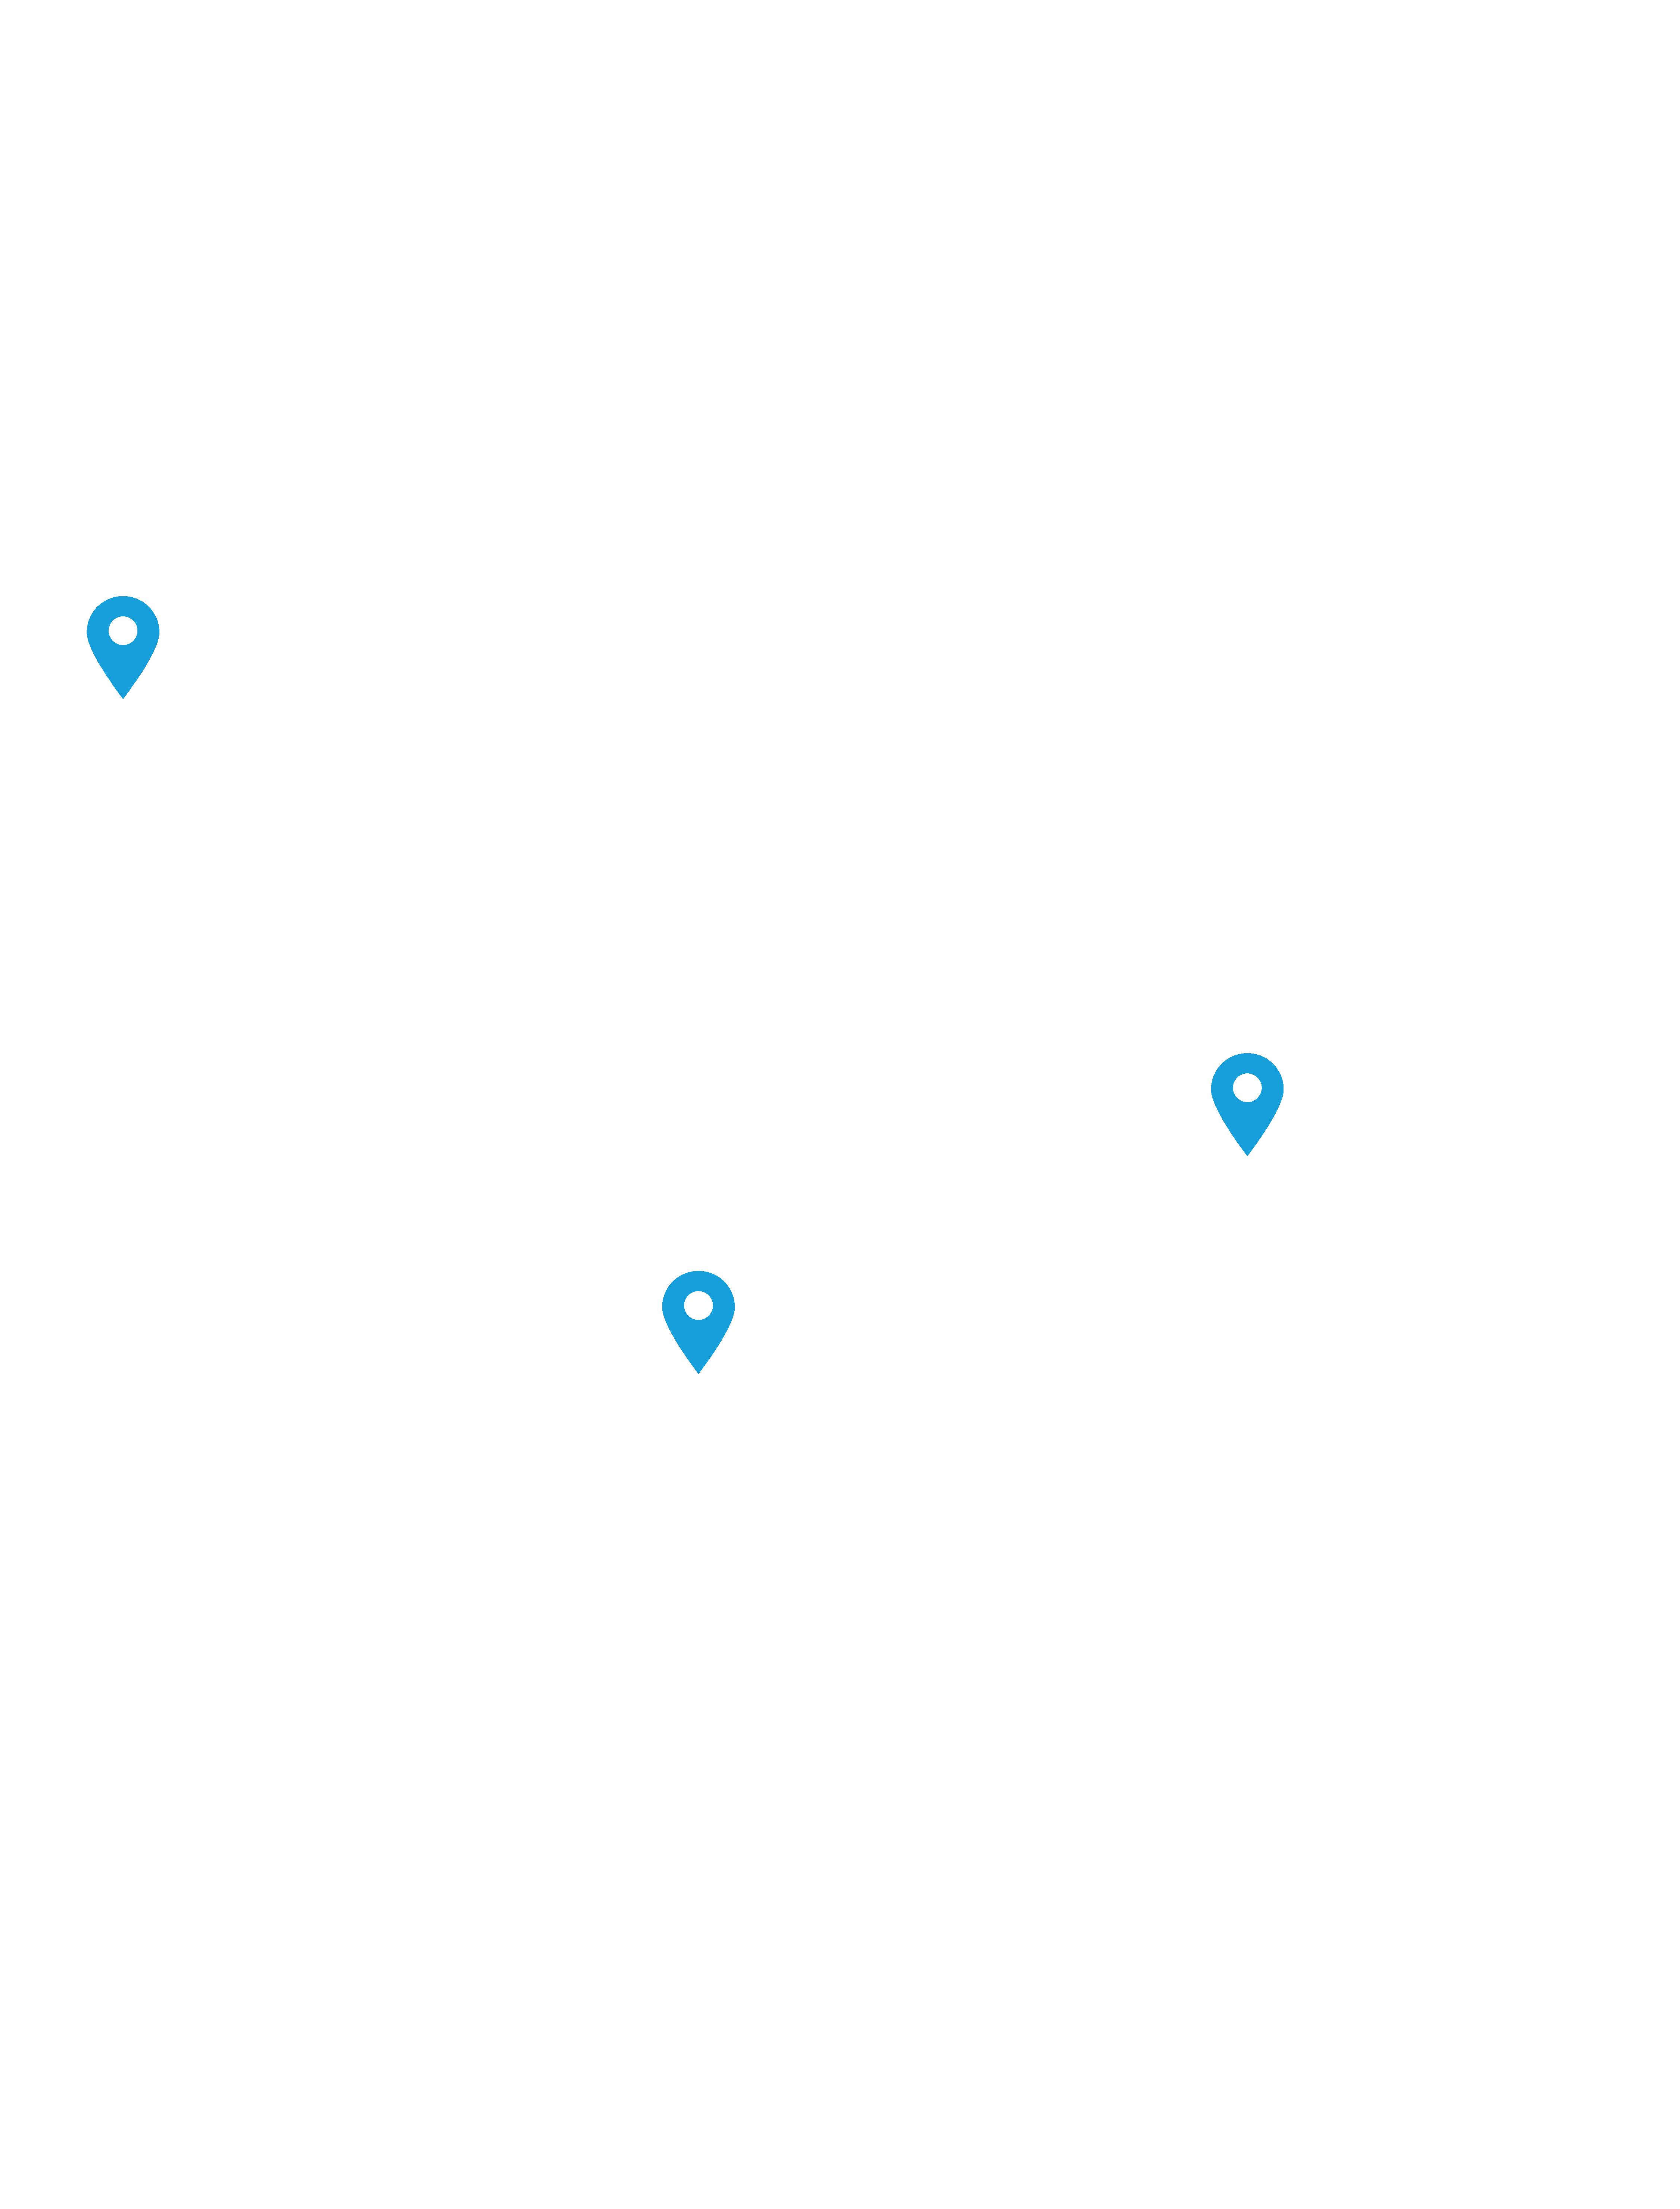 https://vitalfact.com/wp-content/uploads/2020/07/Map-02.png